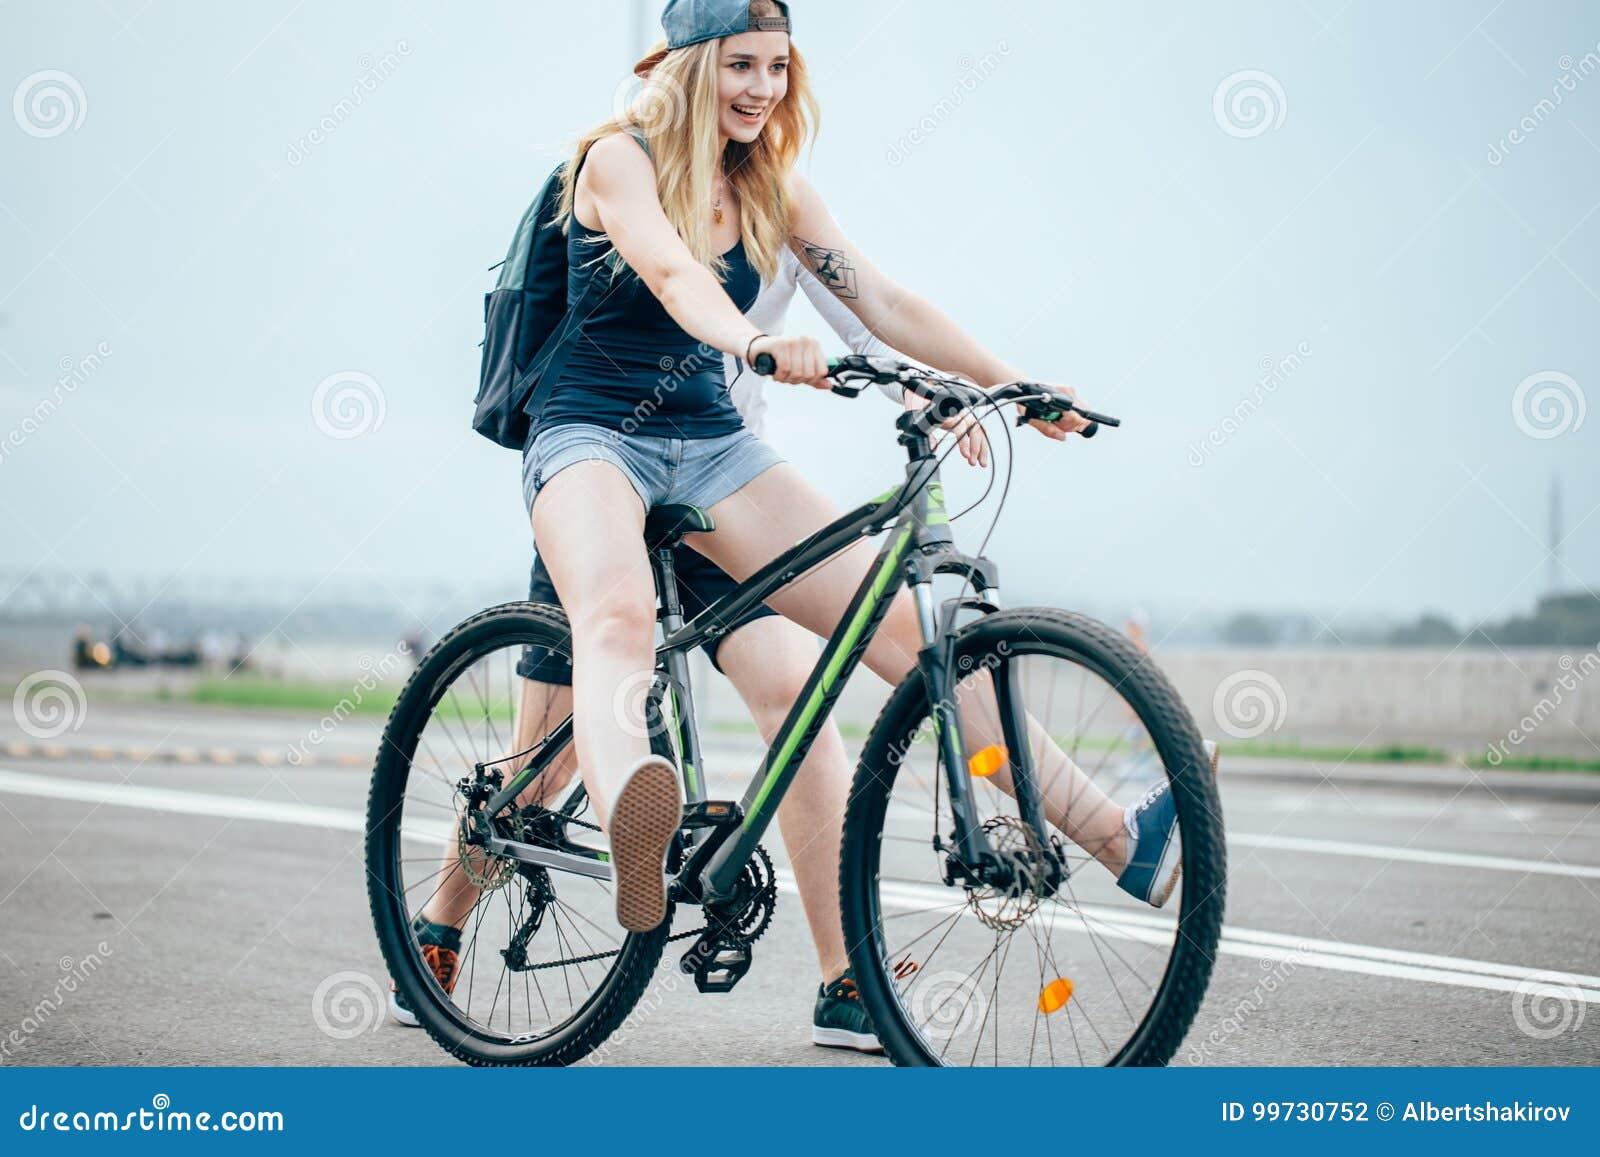 Dating site intre biciclete gratuite Intalnire gratuita Verdun.